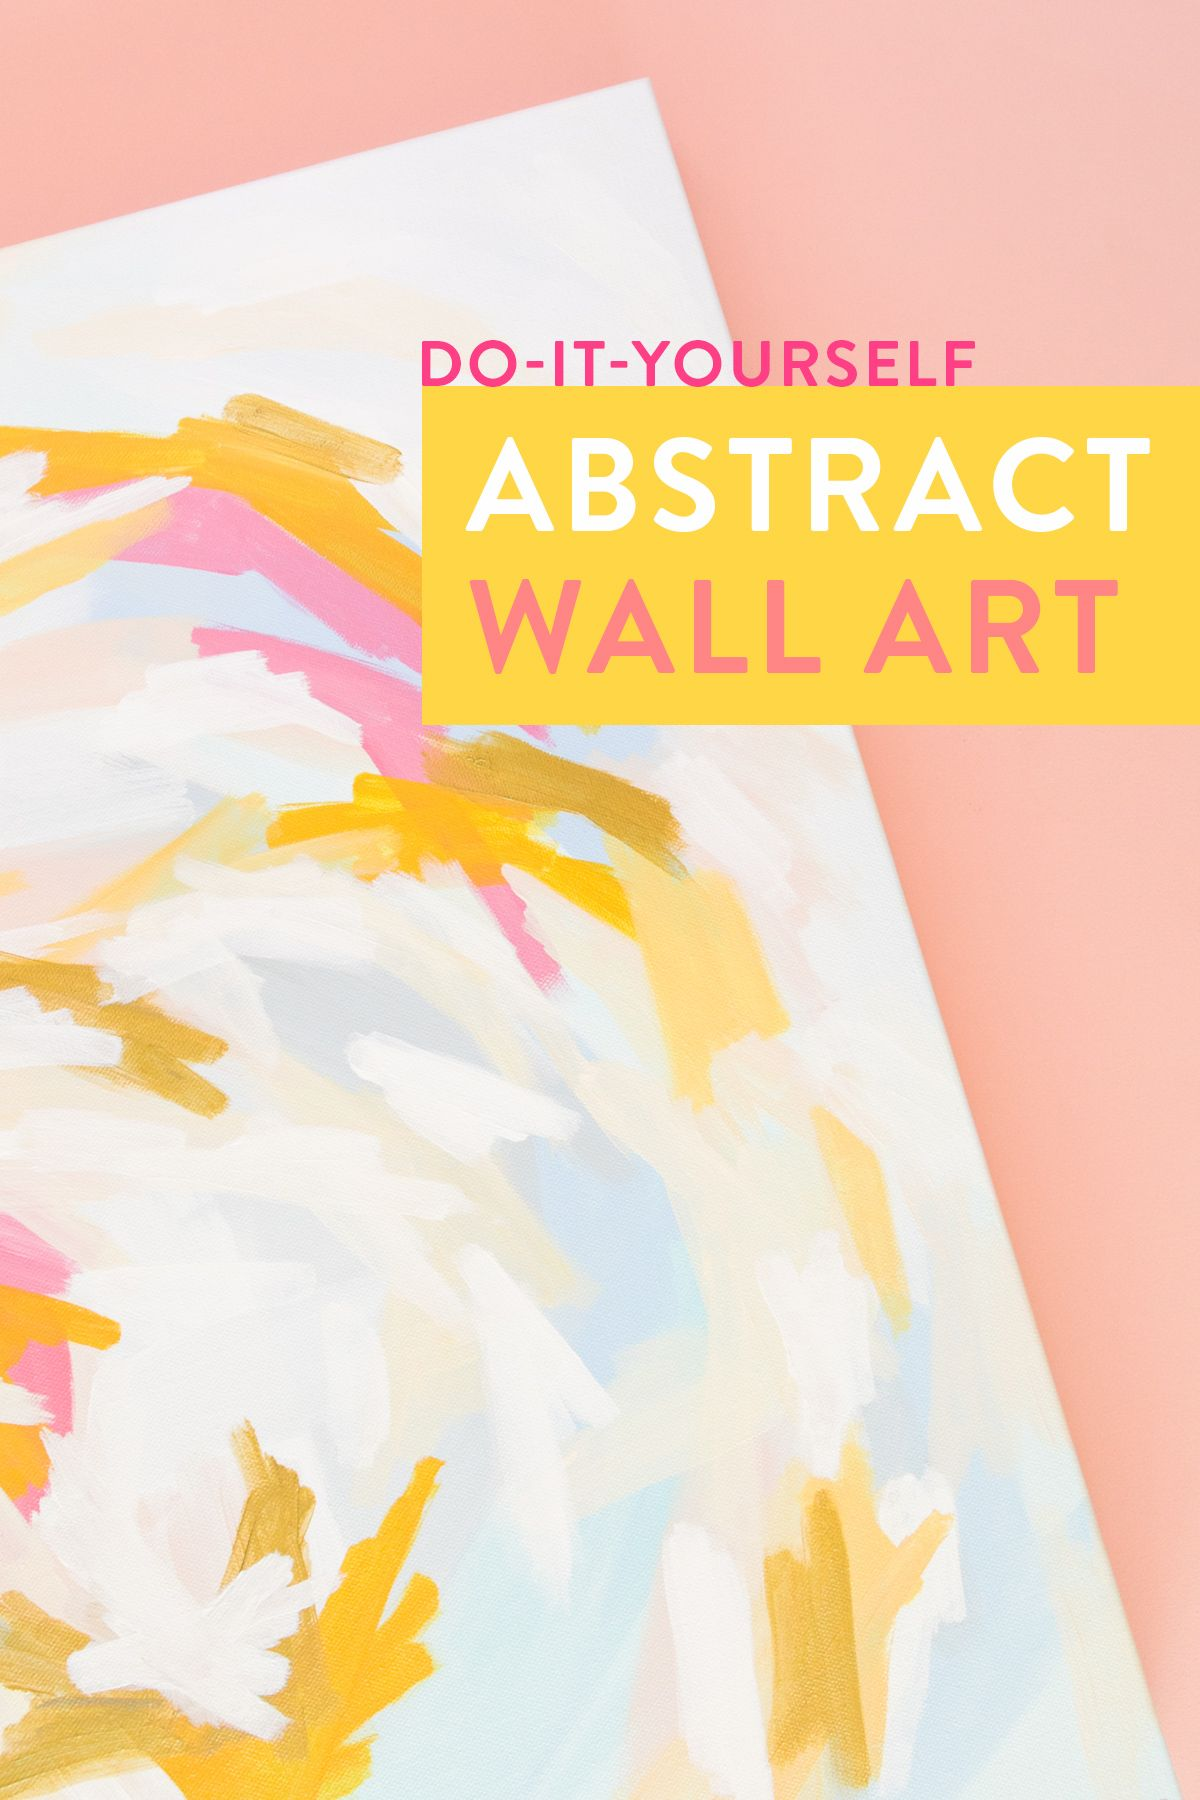 DIY Abstract Wall Art | Pinterest | Abstract wall art, Create and Crafty